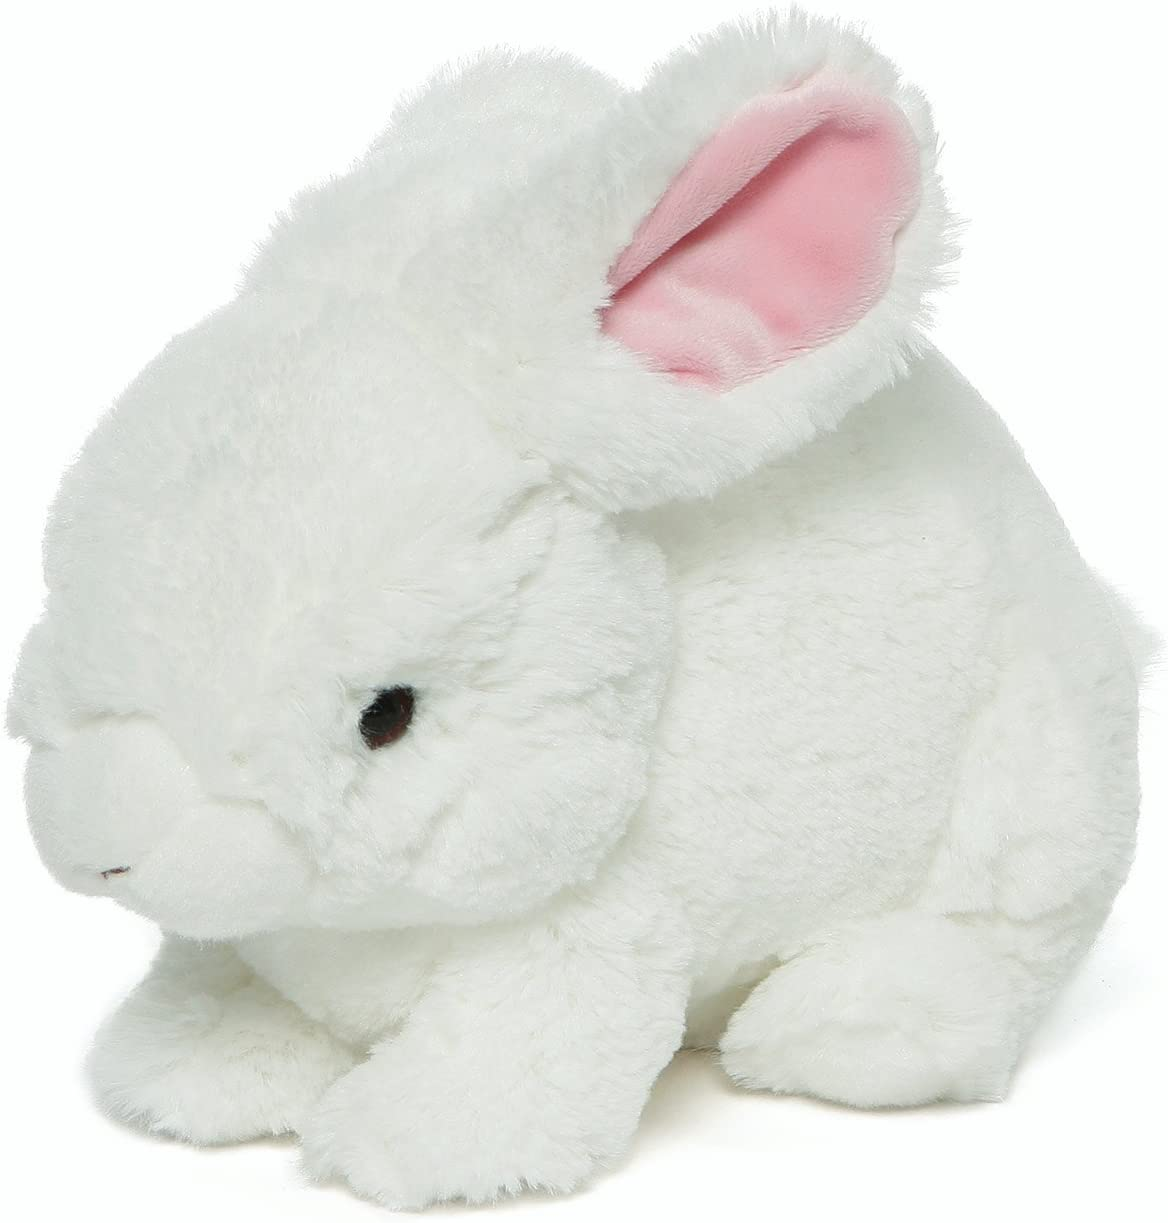 "GUND Easter Whispers Bunny Rabbit Plush Stuffed Animal 12"", White"